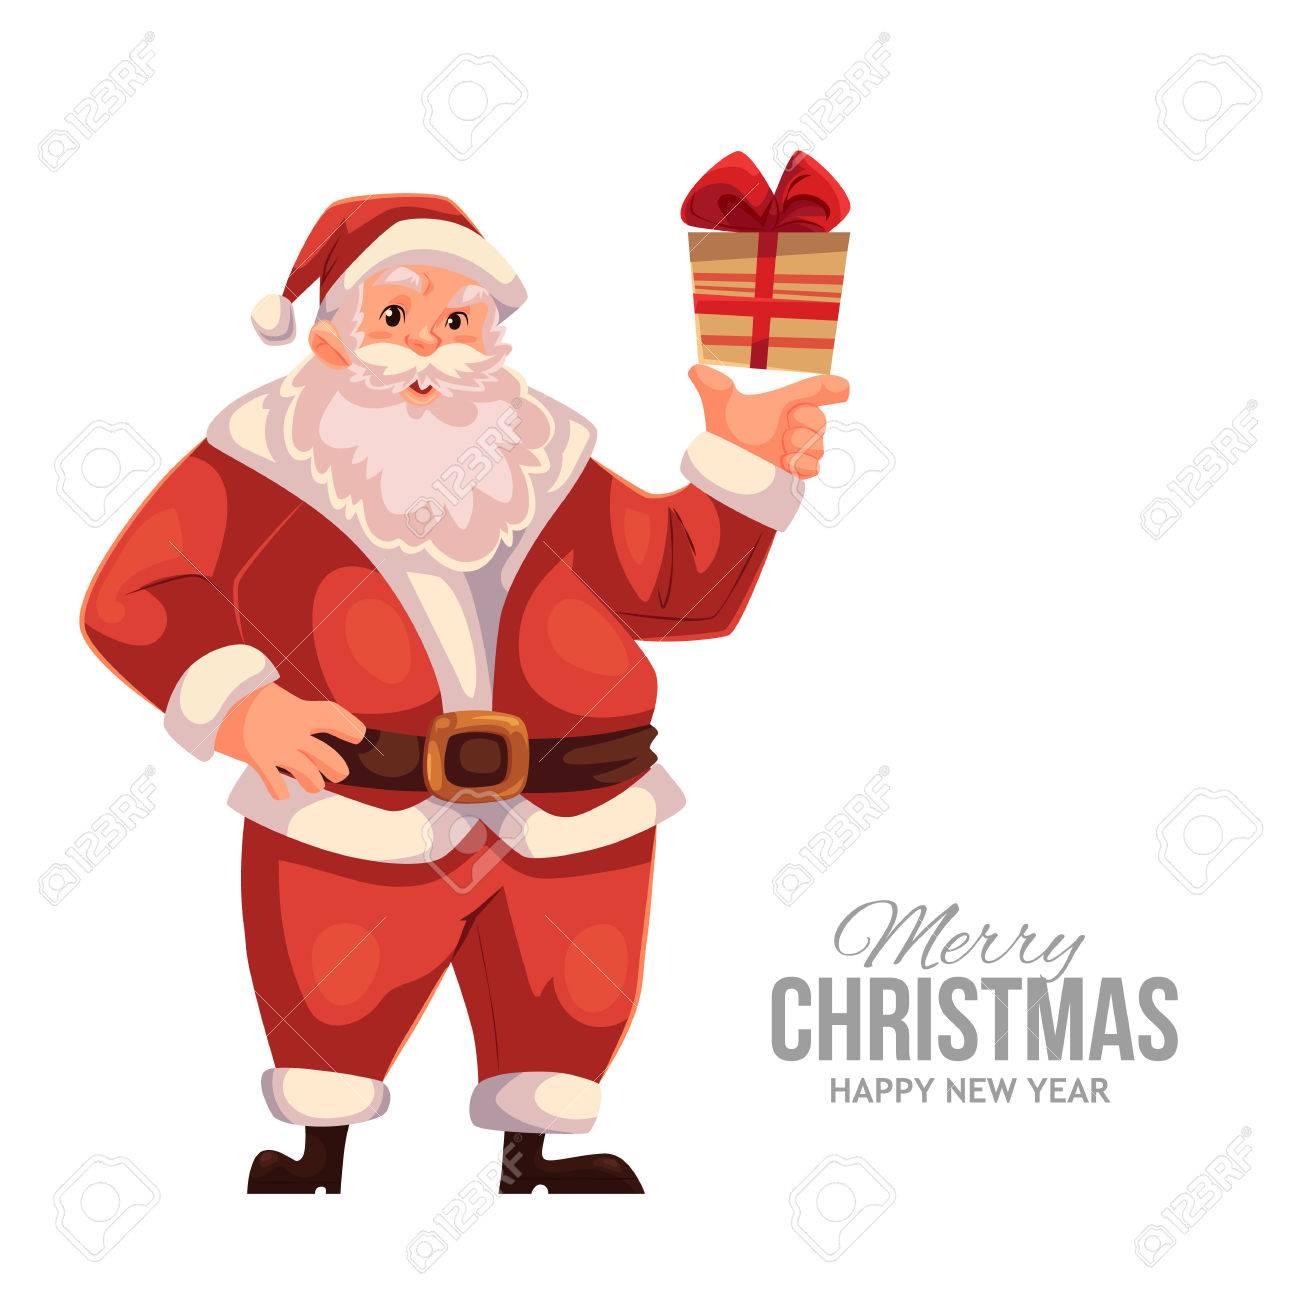 Cartoon Style Santa Claus Holding A Small Gift Box Christmas